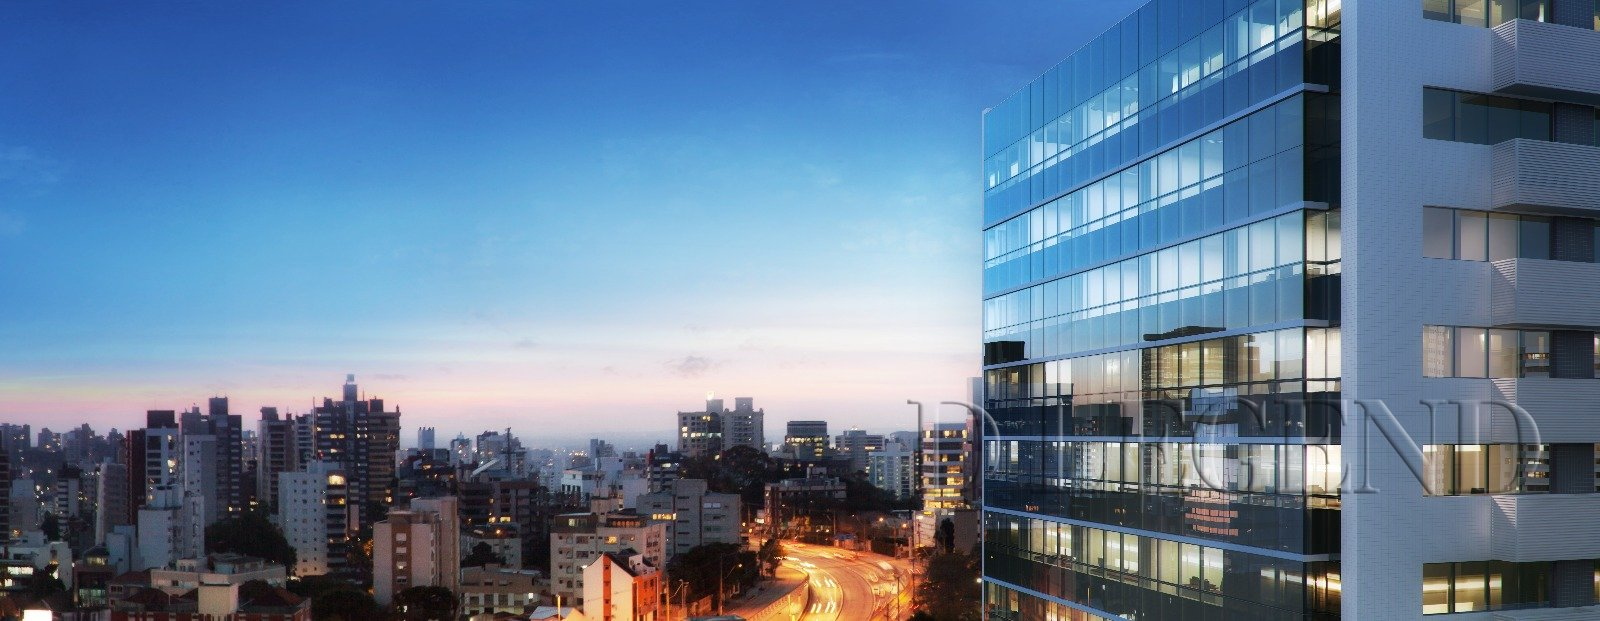 DOC Santana - Avenida Princesa Isabel, 652 - Santana - Porto Alegre